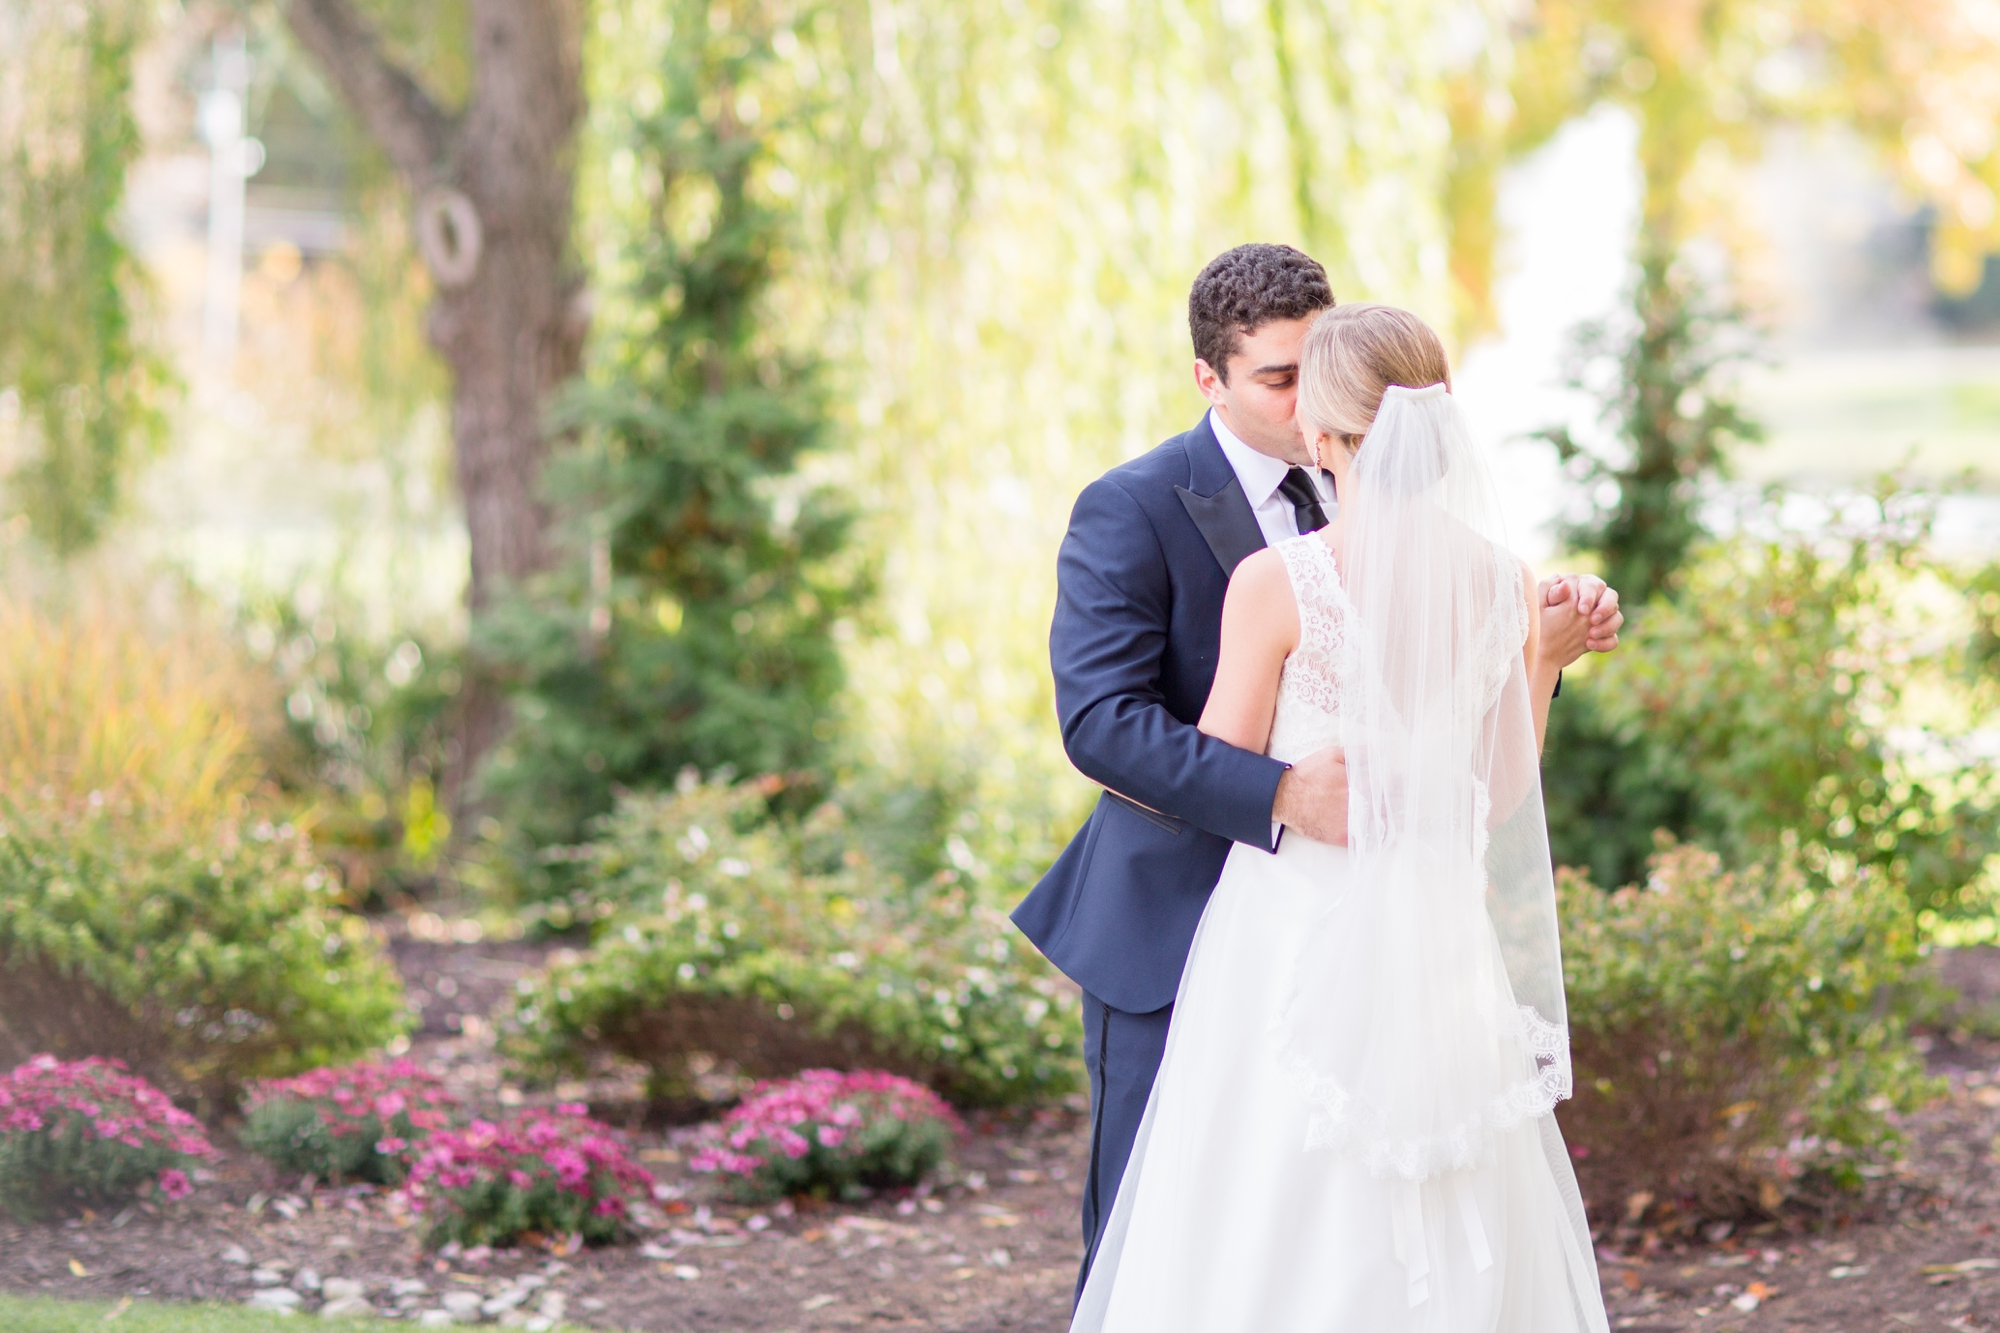 2-Finkel Wedding Bride & Groom Portraits-191_anna grace photography maryland wedding photographer turf valley.jpg